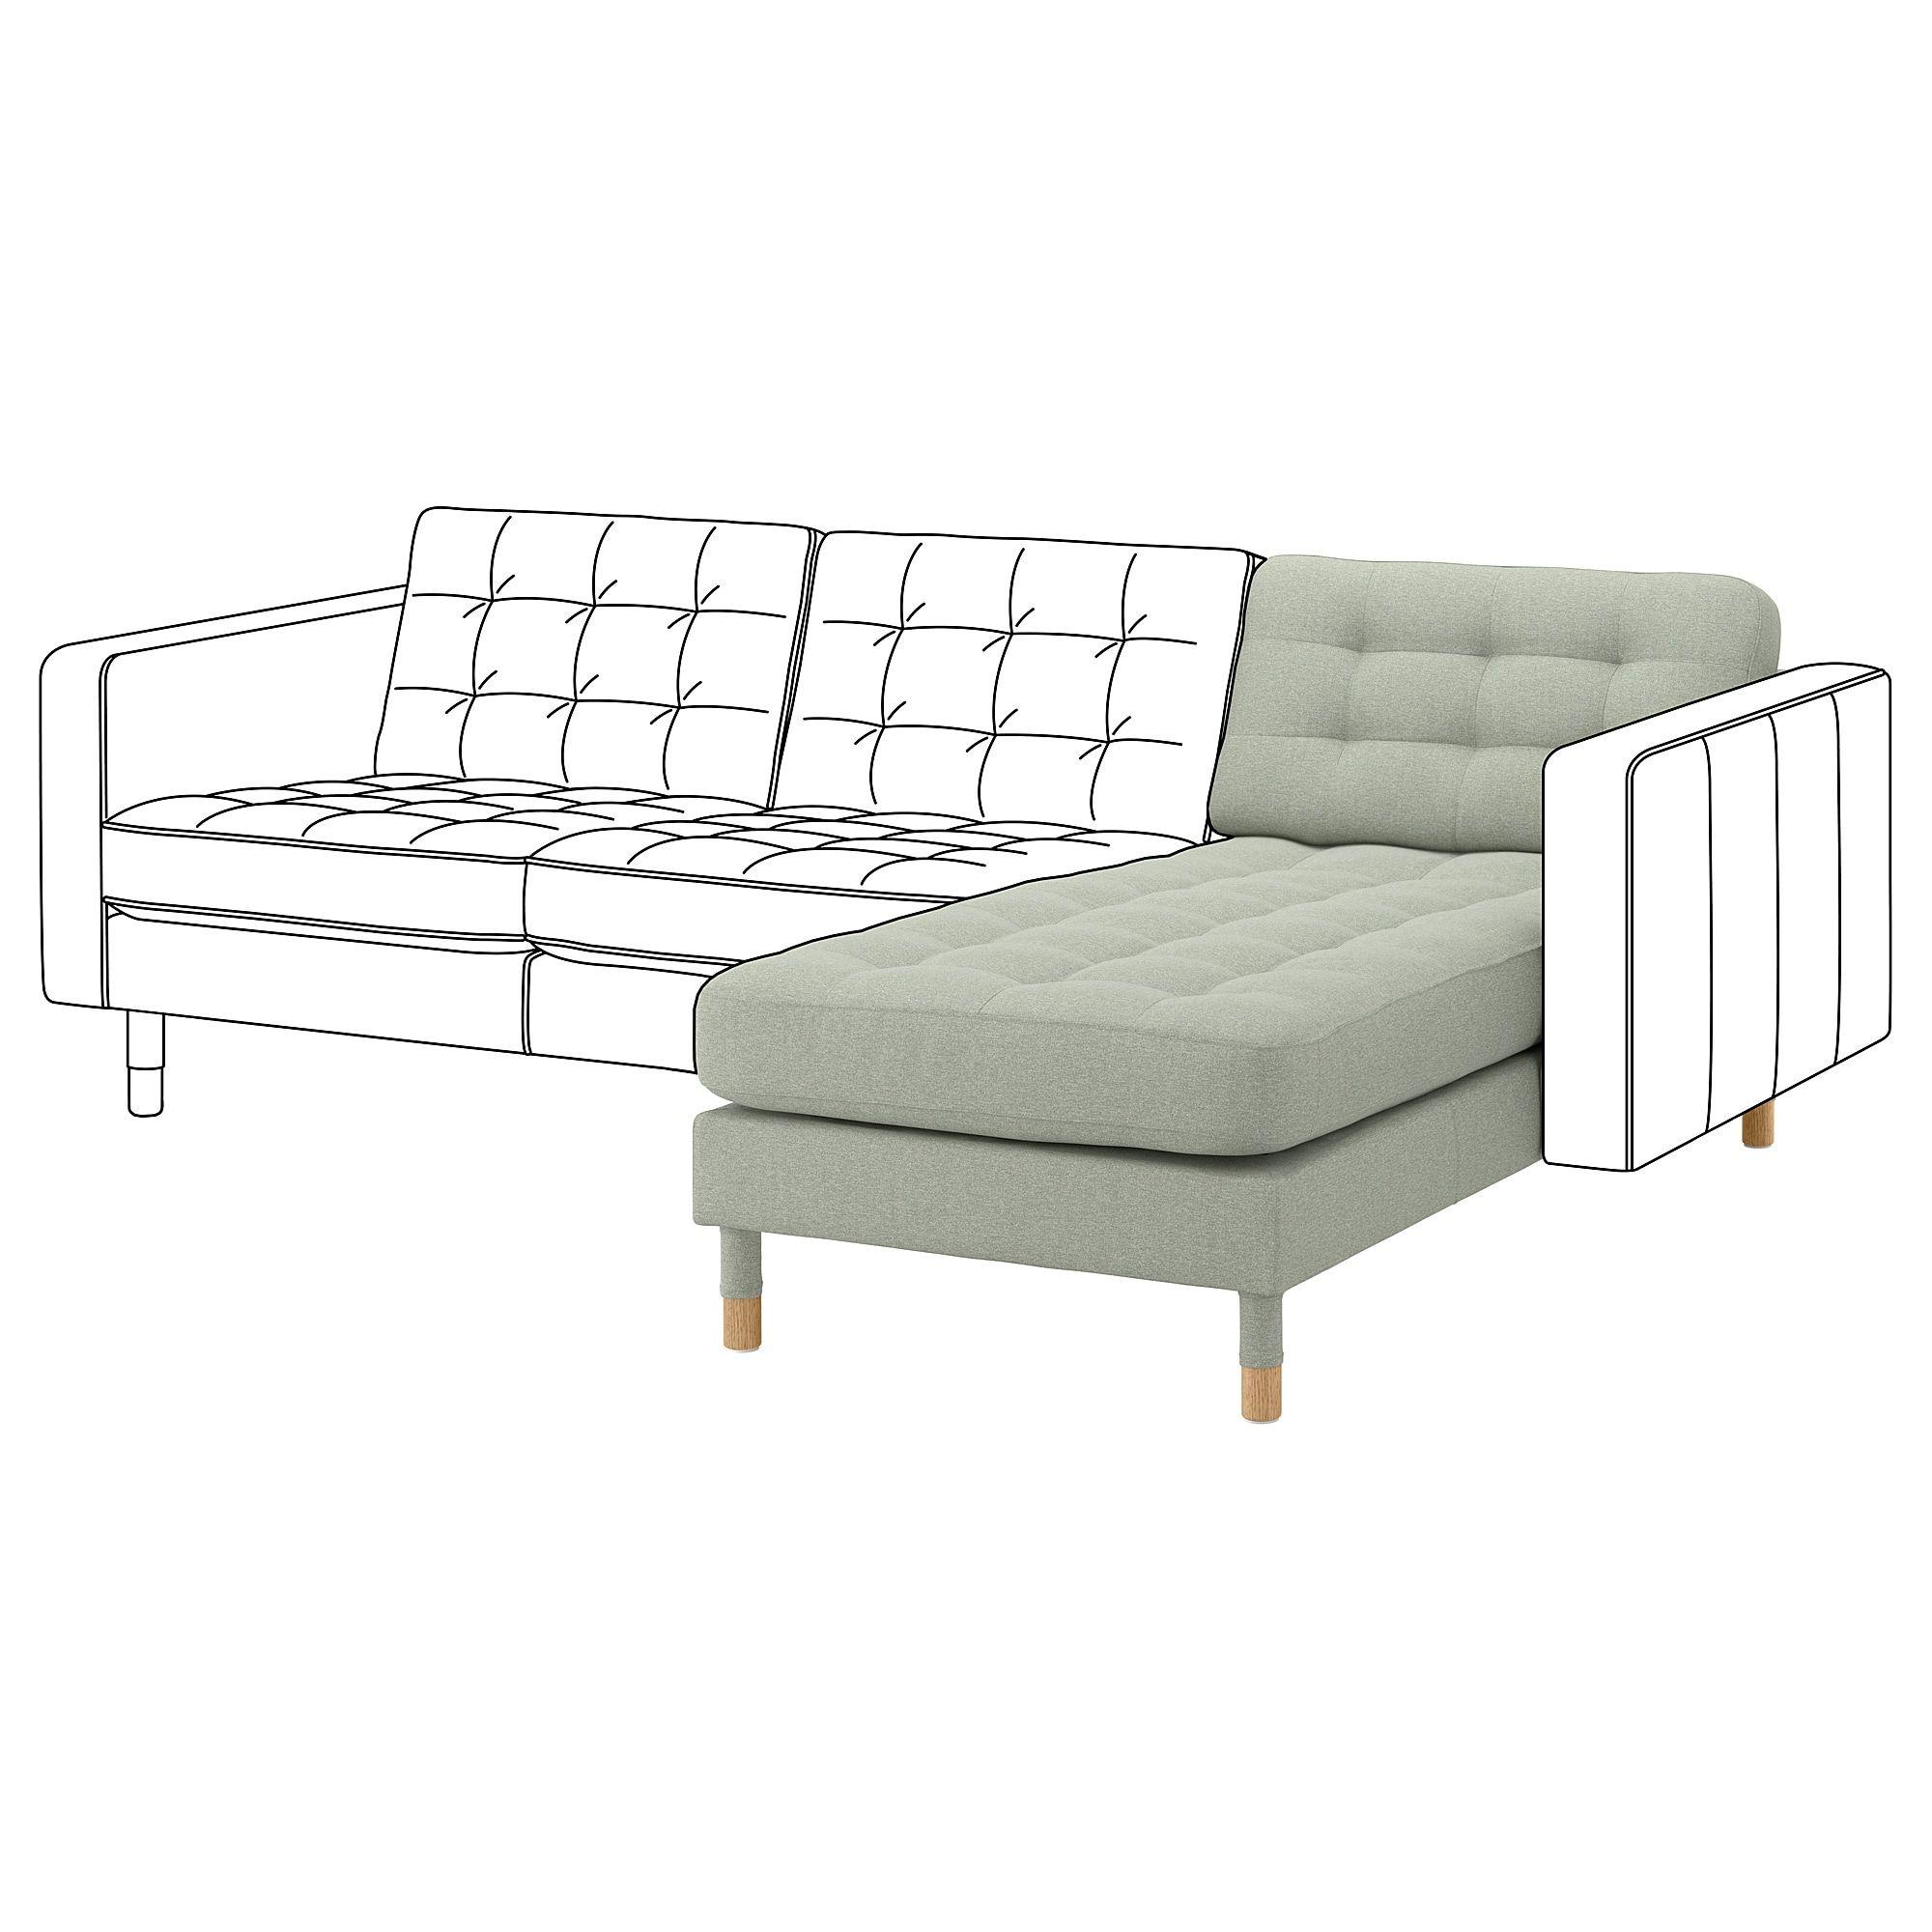 Us Furniture And Home Furnishings Modular Sofa Leather Sofa Ikea